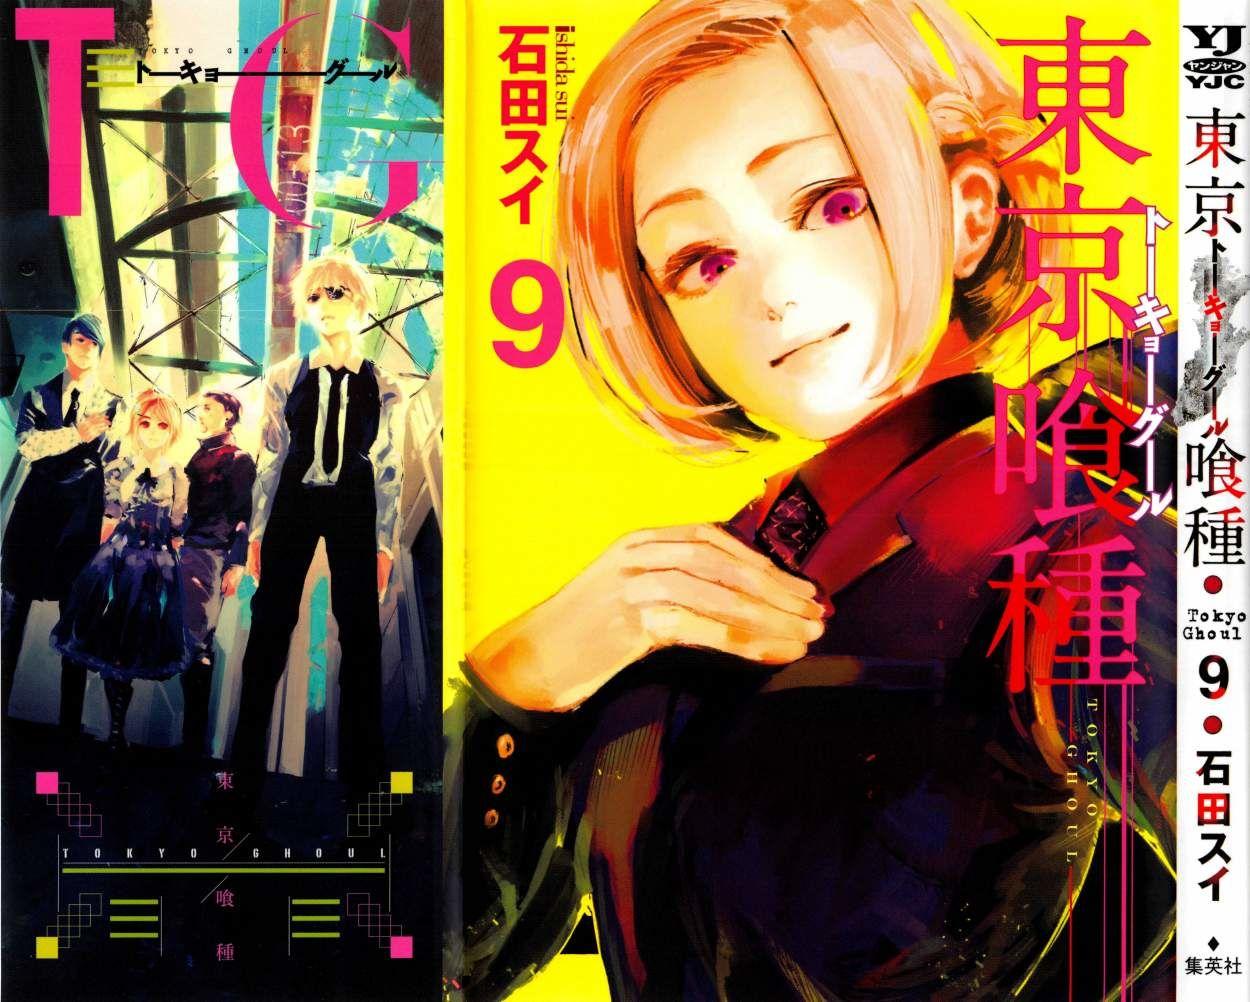 http://c5.ninemanga.com/es_manga/60/60/191826/b7a545636dbde3a0a794364791a4cd13.jpg Page 2